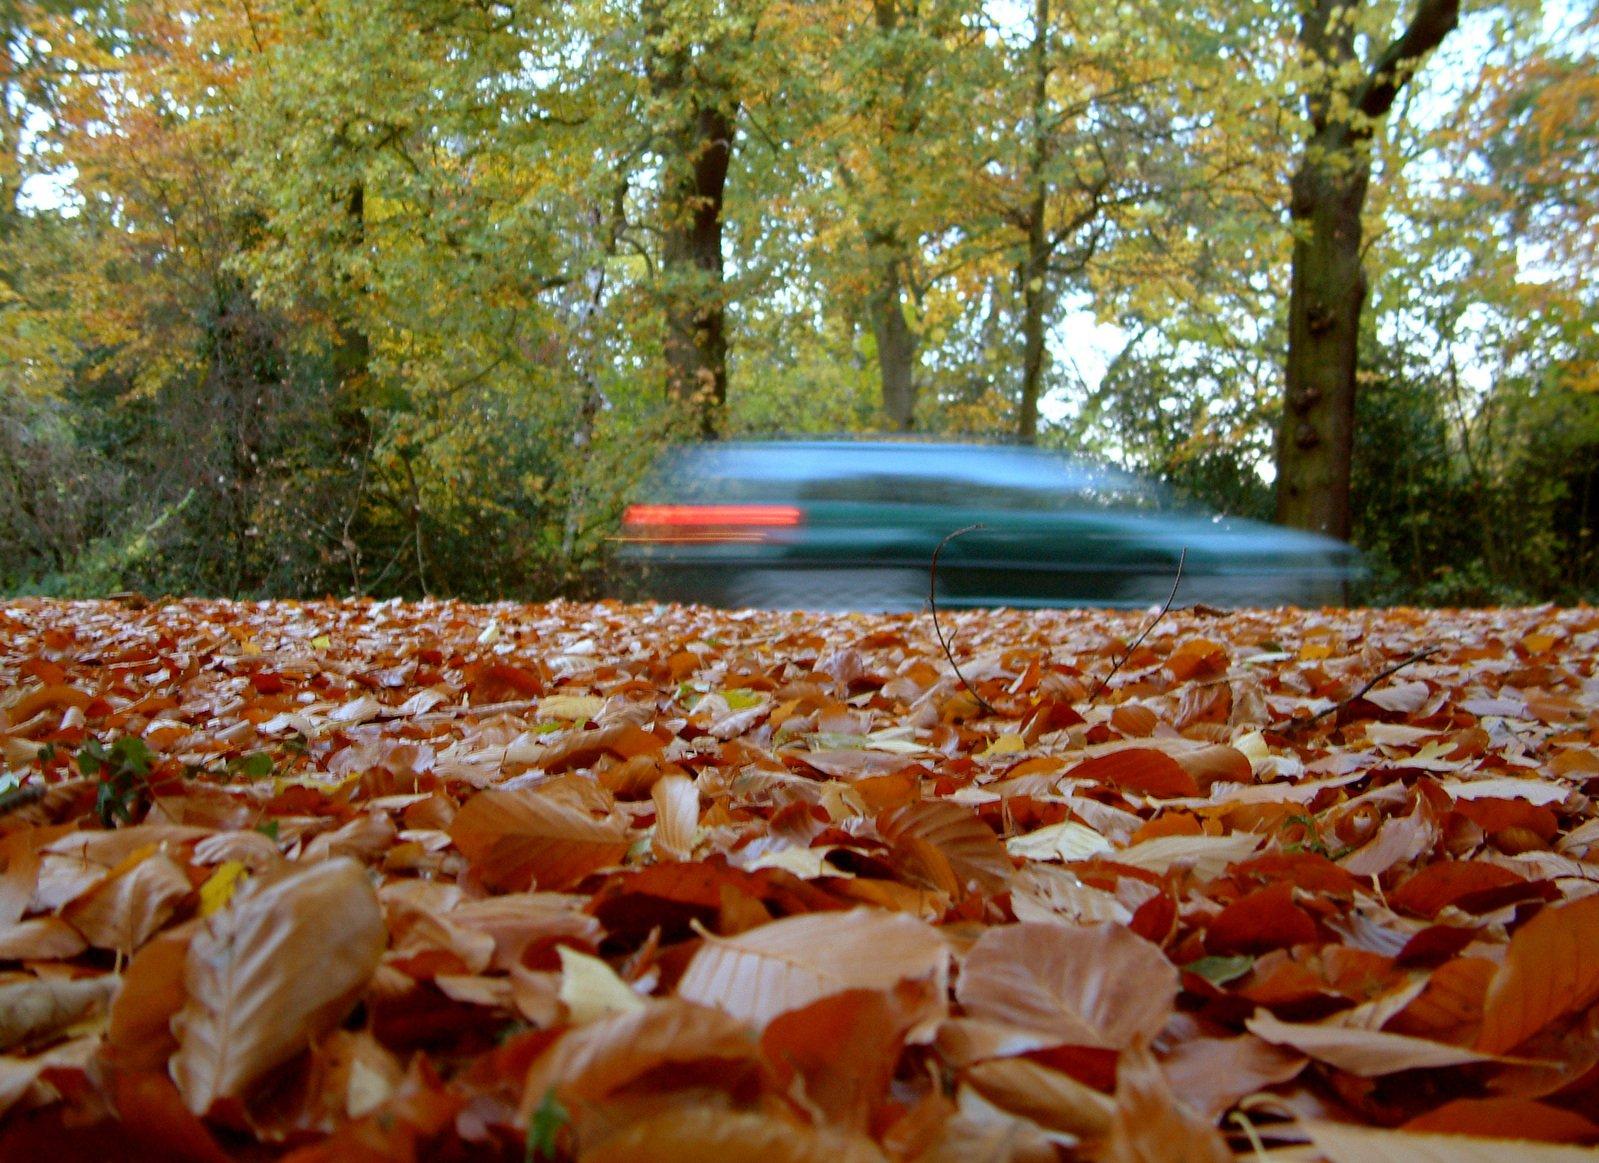 Blurred car in autumn leaves